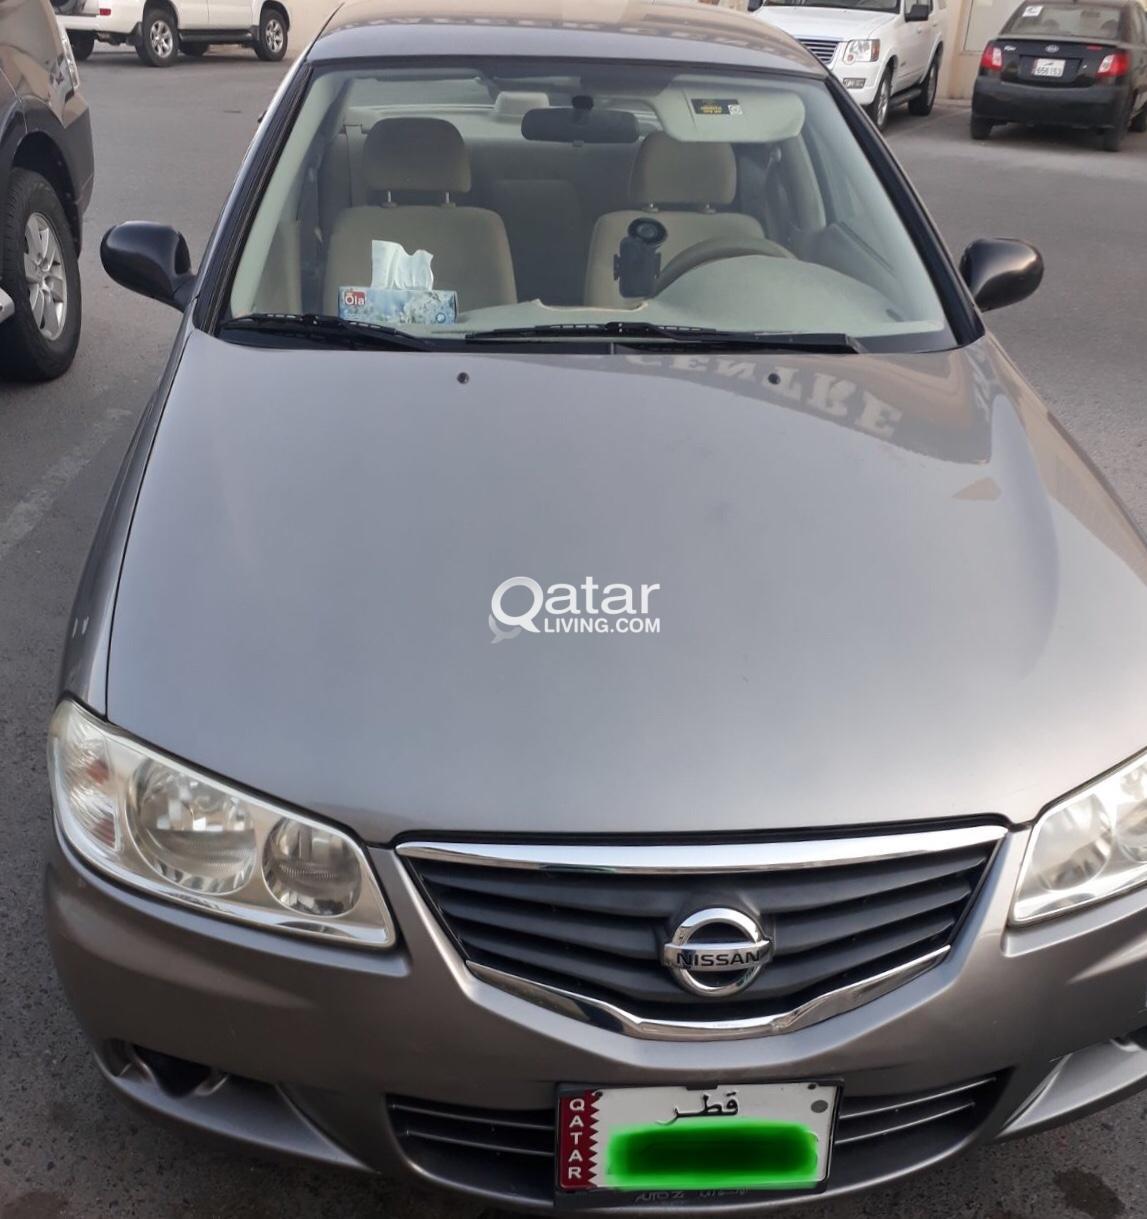 Nissan Sunny 2010 Japan Qatar Living